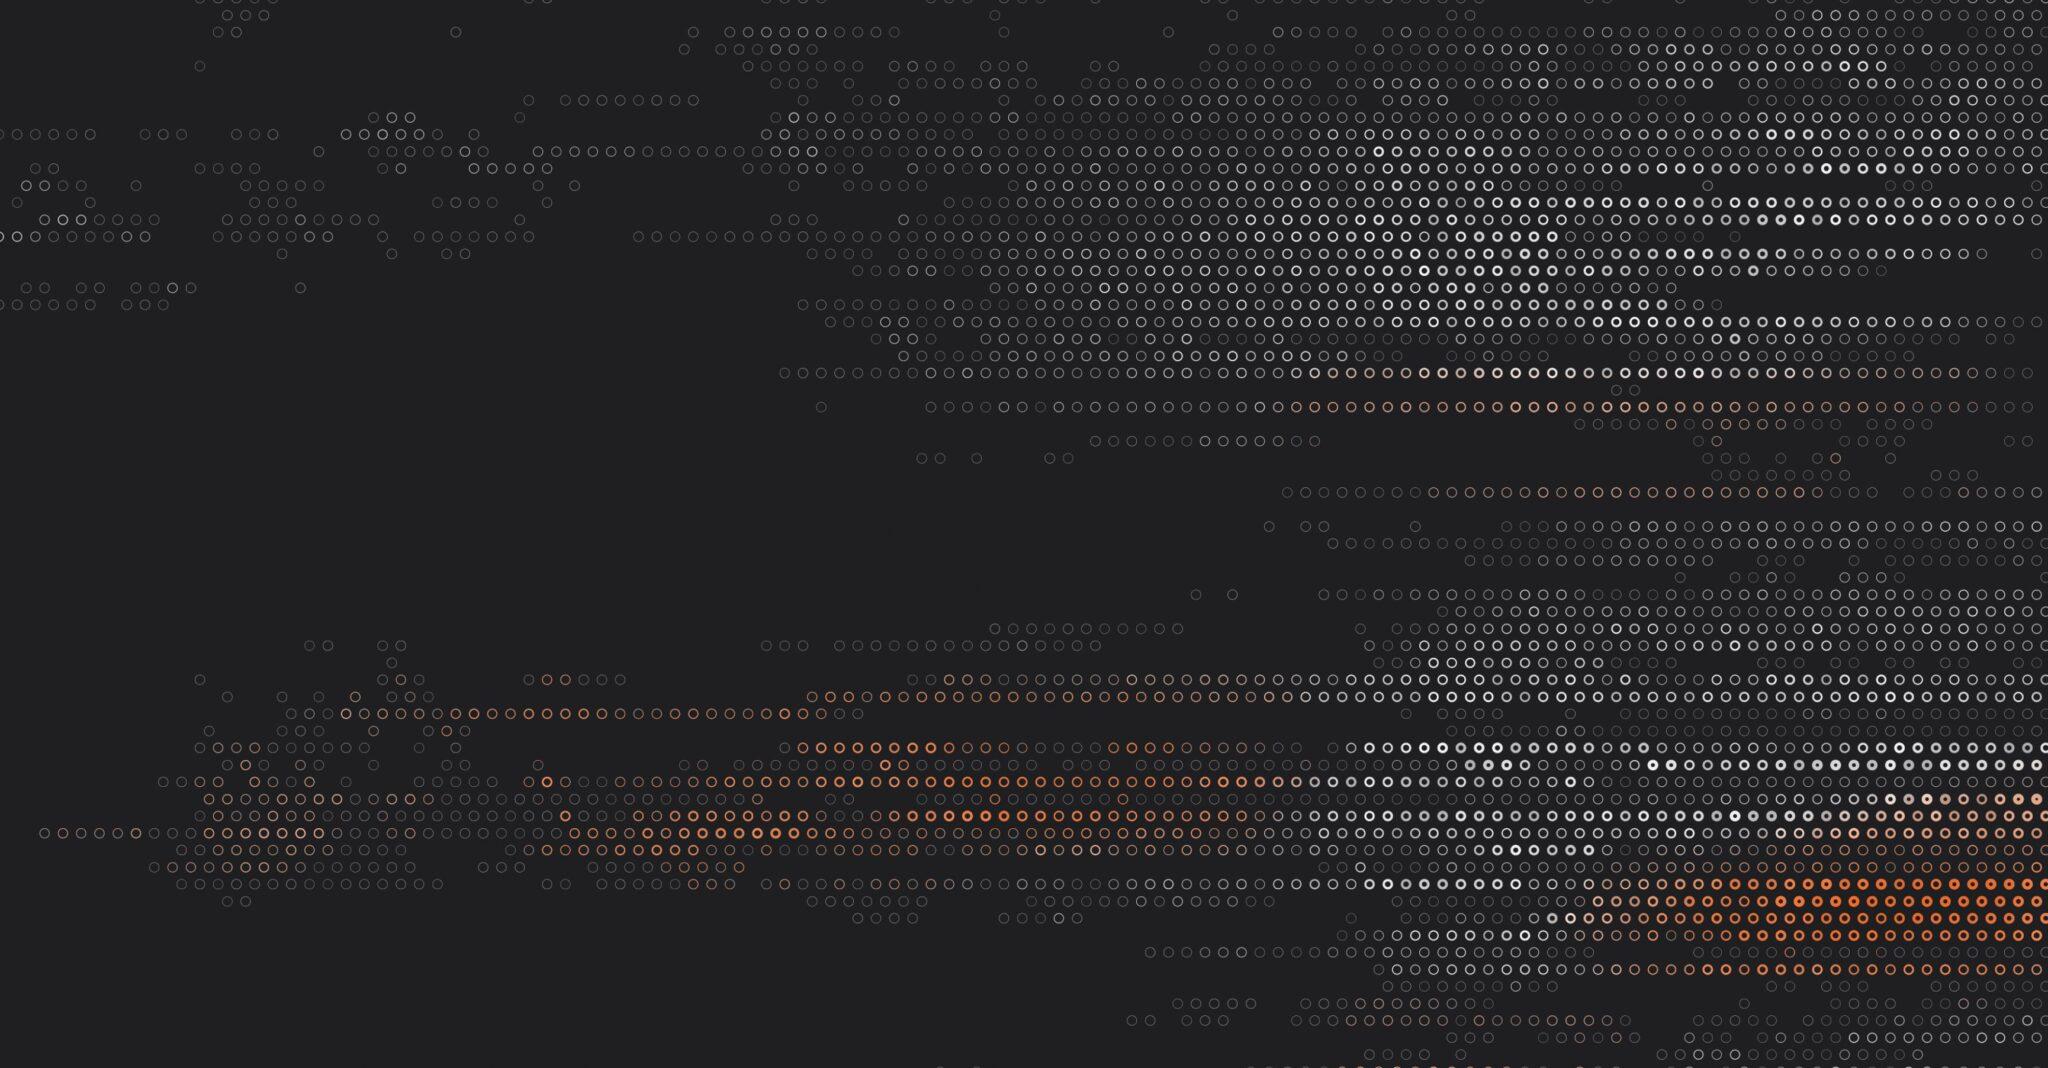 Kenza knowledge education blockchain article sustainable adoption digital circle design